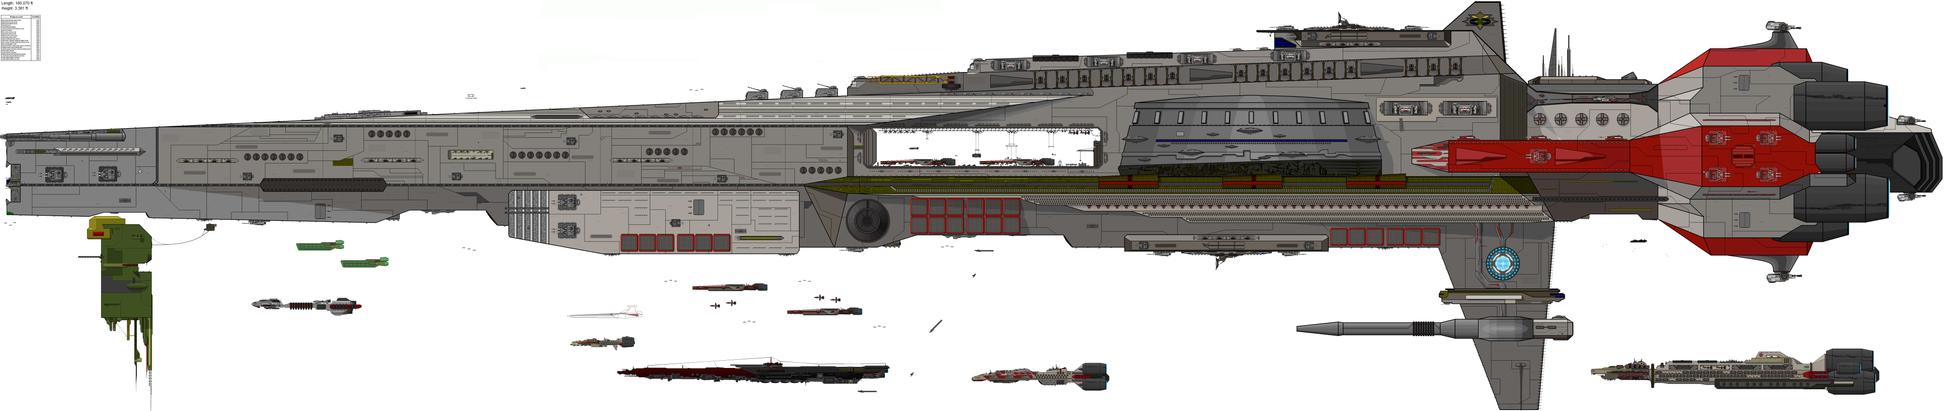 Really Really Big SpaceShip by DJBIG